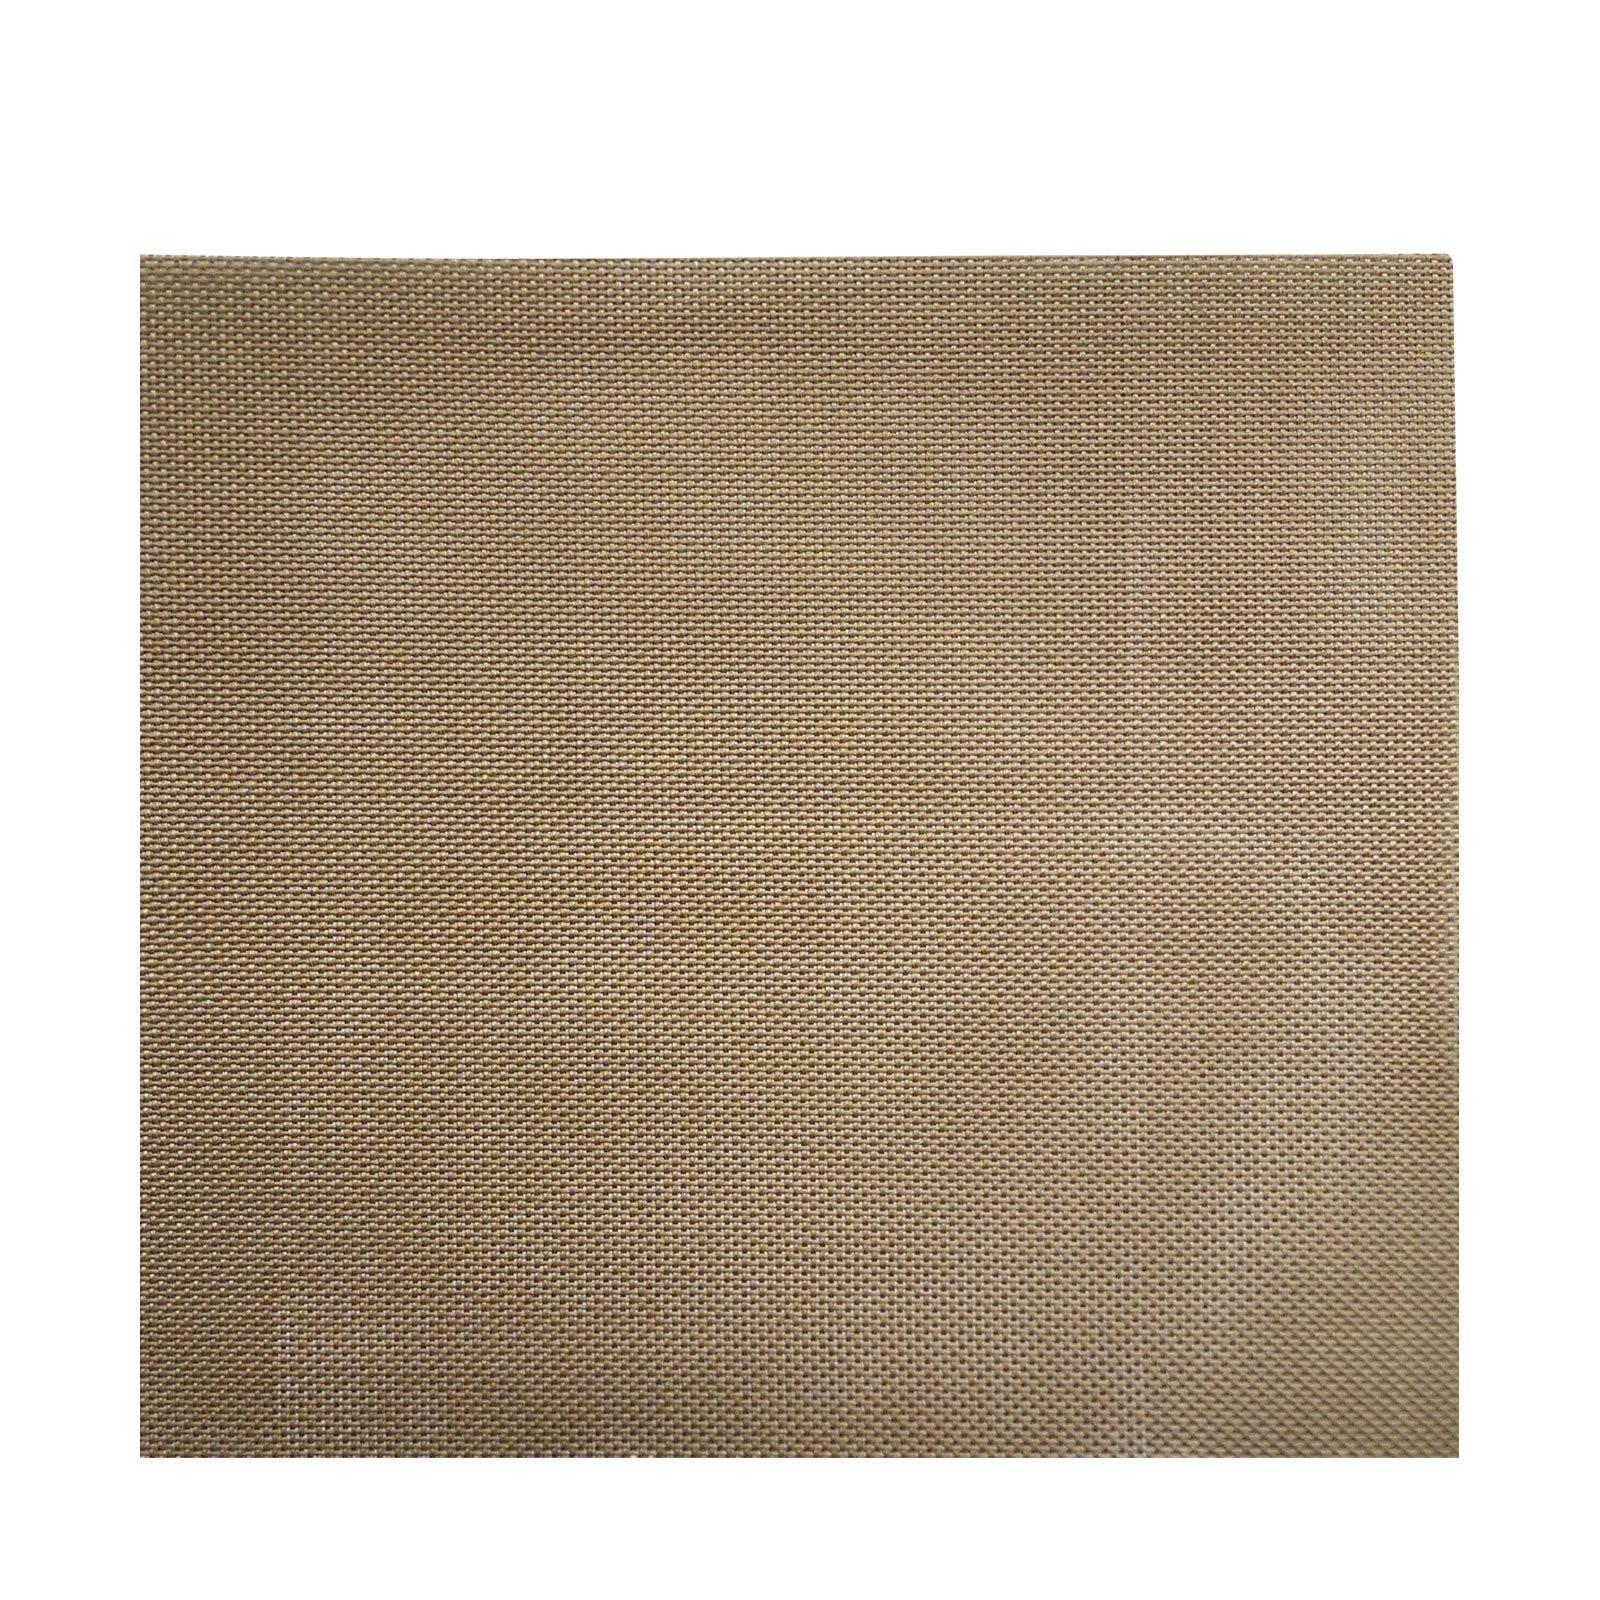 BioChef Savana 6/9/12 Tray Mesh Sheet - Packs